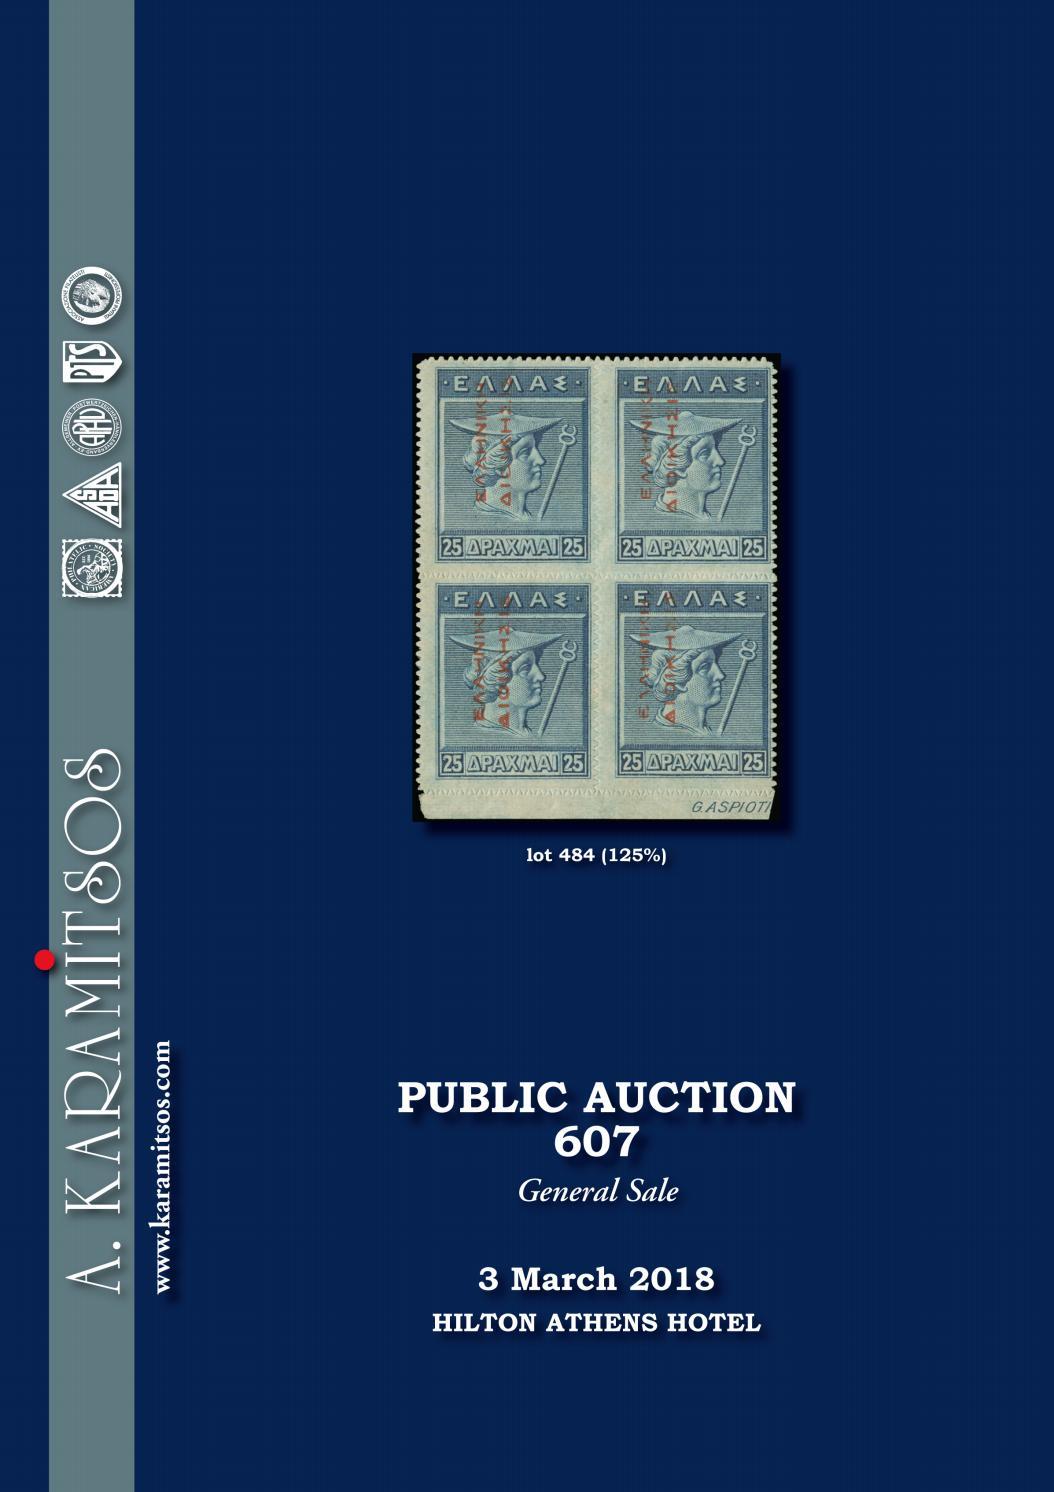 A Karamitsos Public Auction 607 by A  Karamitsos - issuu